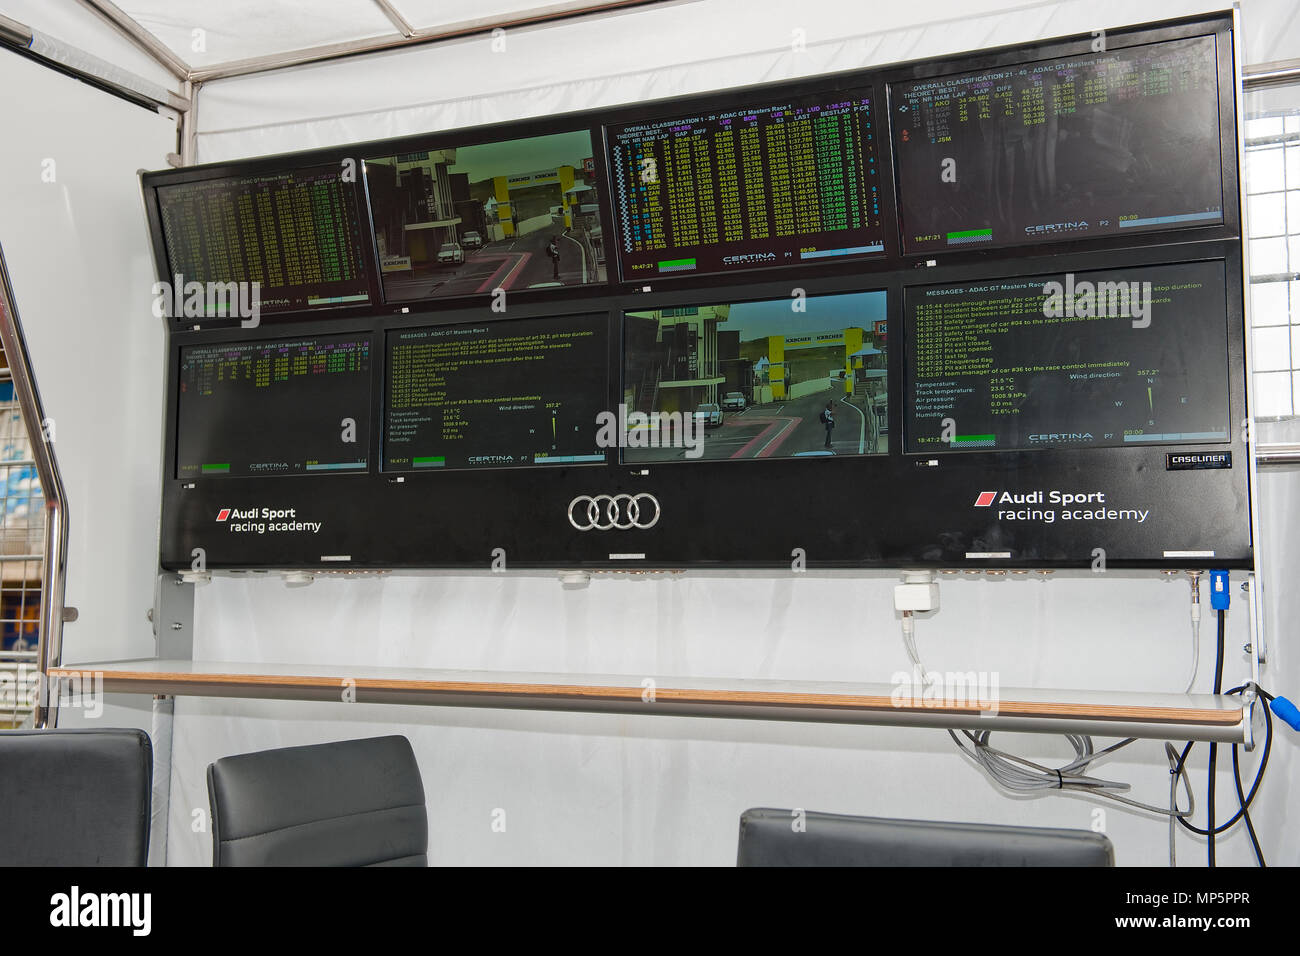 race track Circuit Zandvoort, Netherlands | Rennstrecke Zandvoort, Niederlande - Stock Image